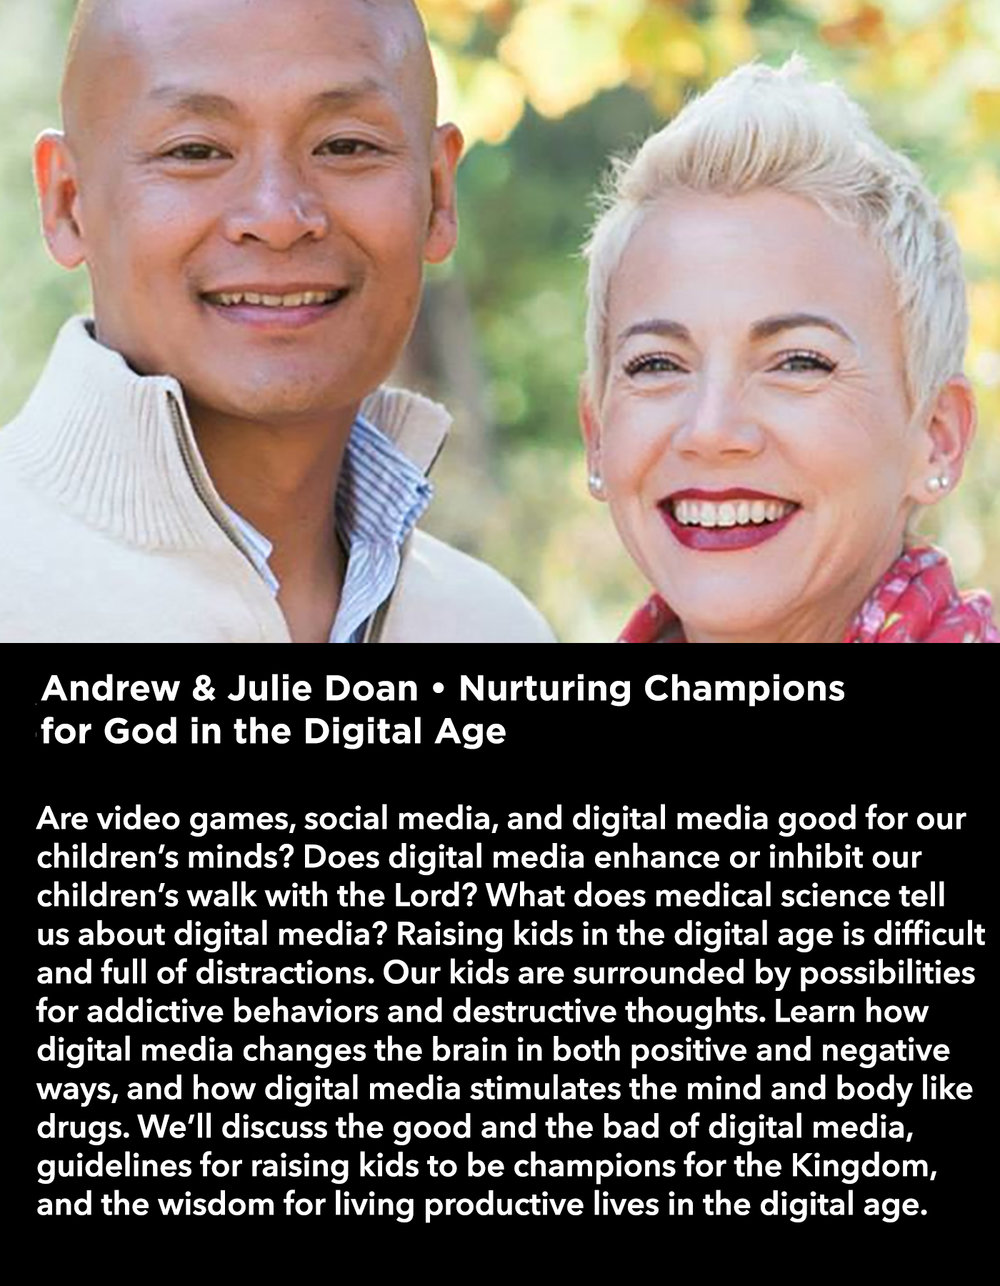 Doan, Andrew & Julie 4.jpg